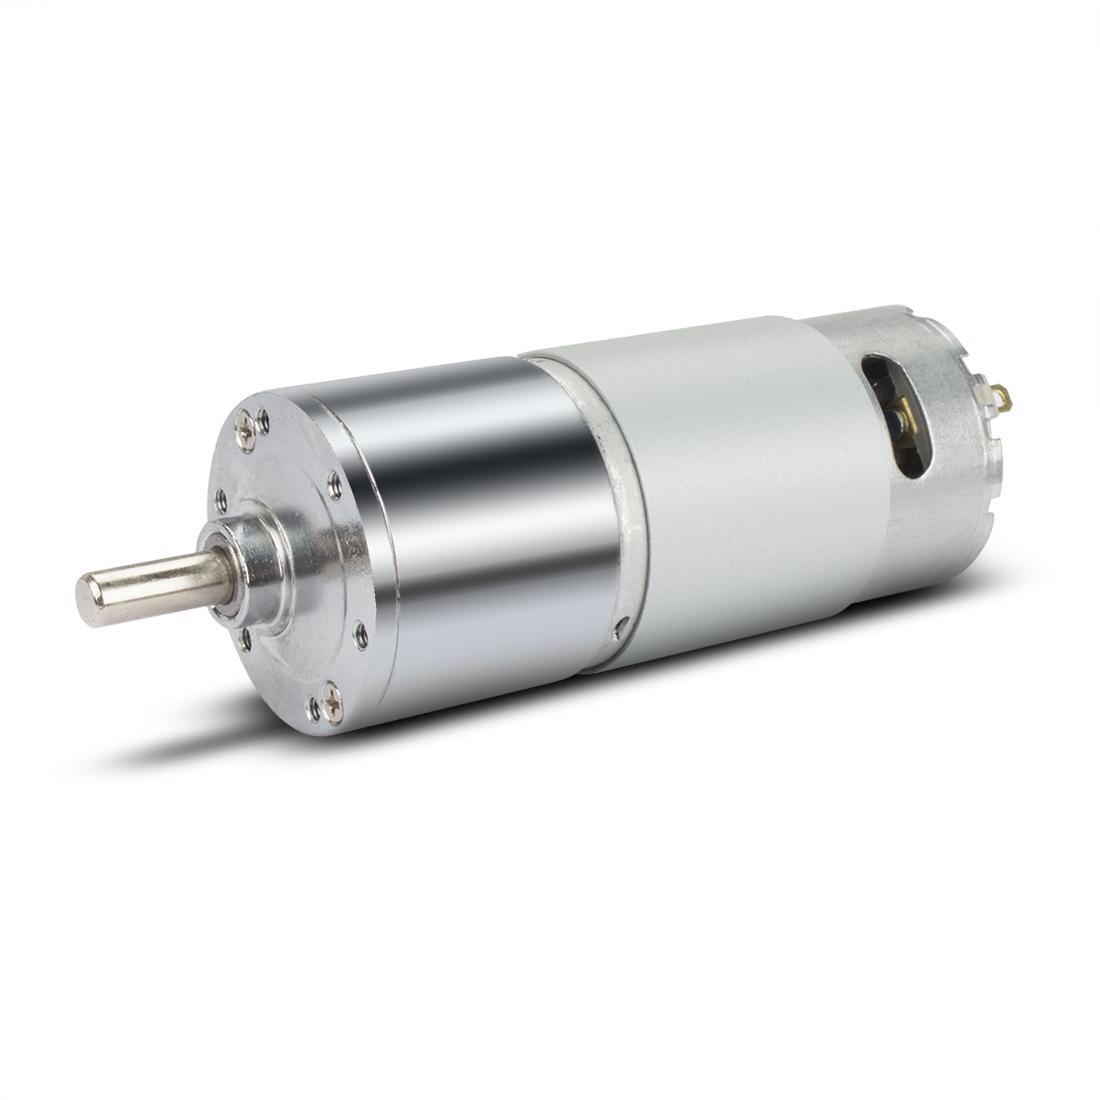 ZGB37RH DC 12V 60RPM Micro Gear Box Motor Speed Reduction Eccentric Output Shaft